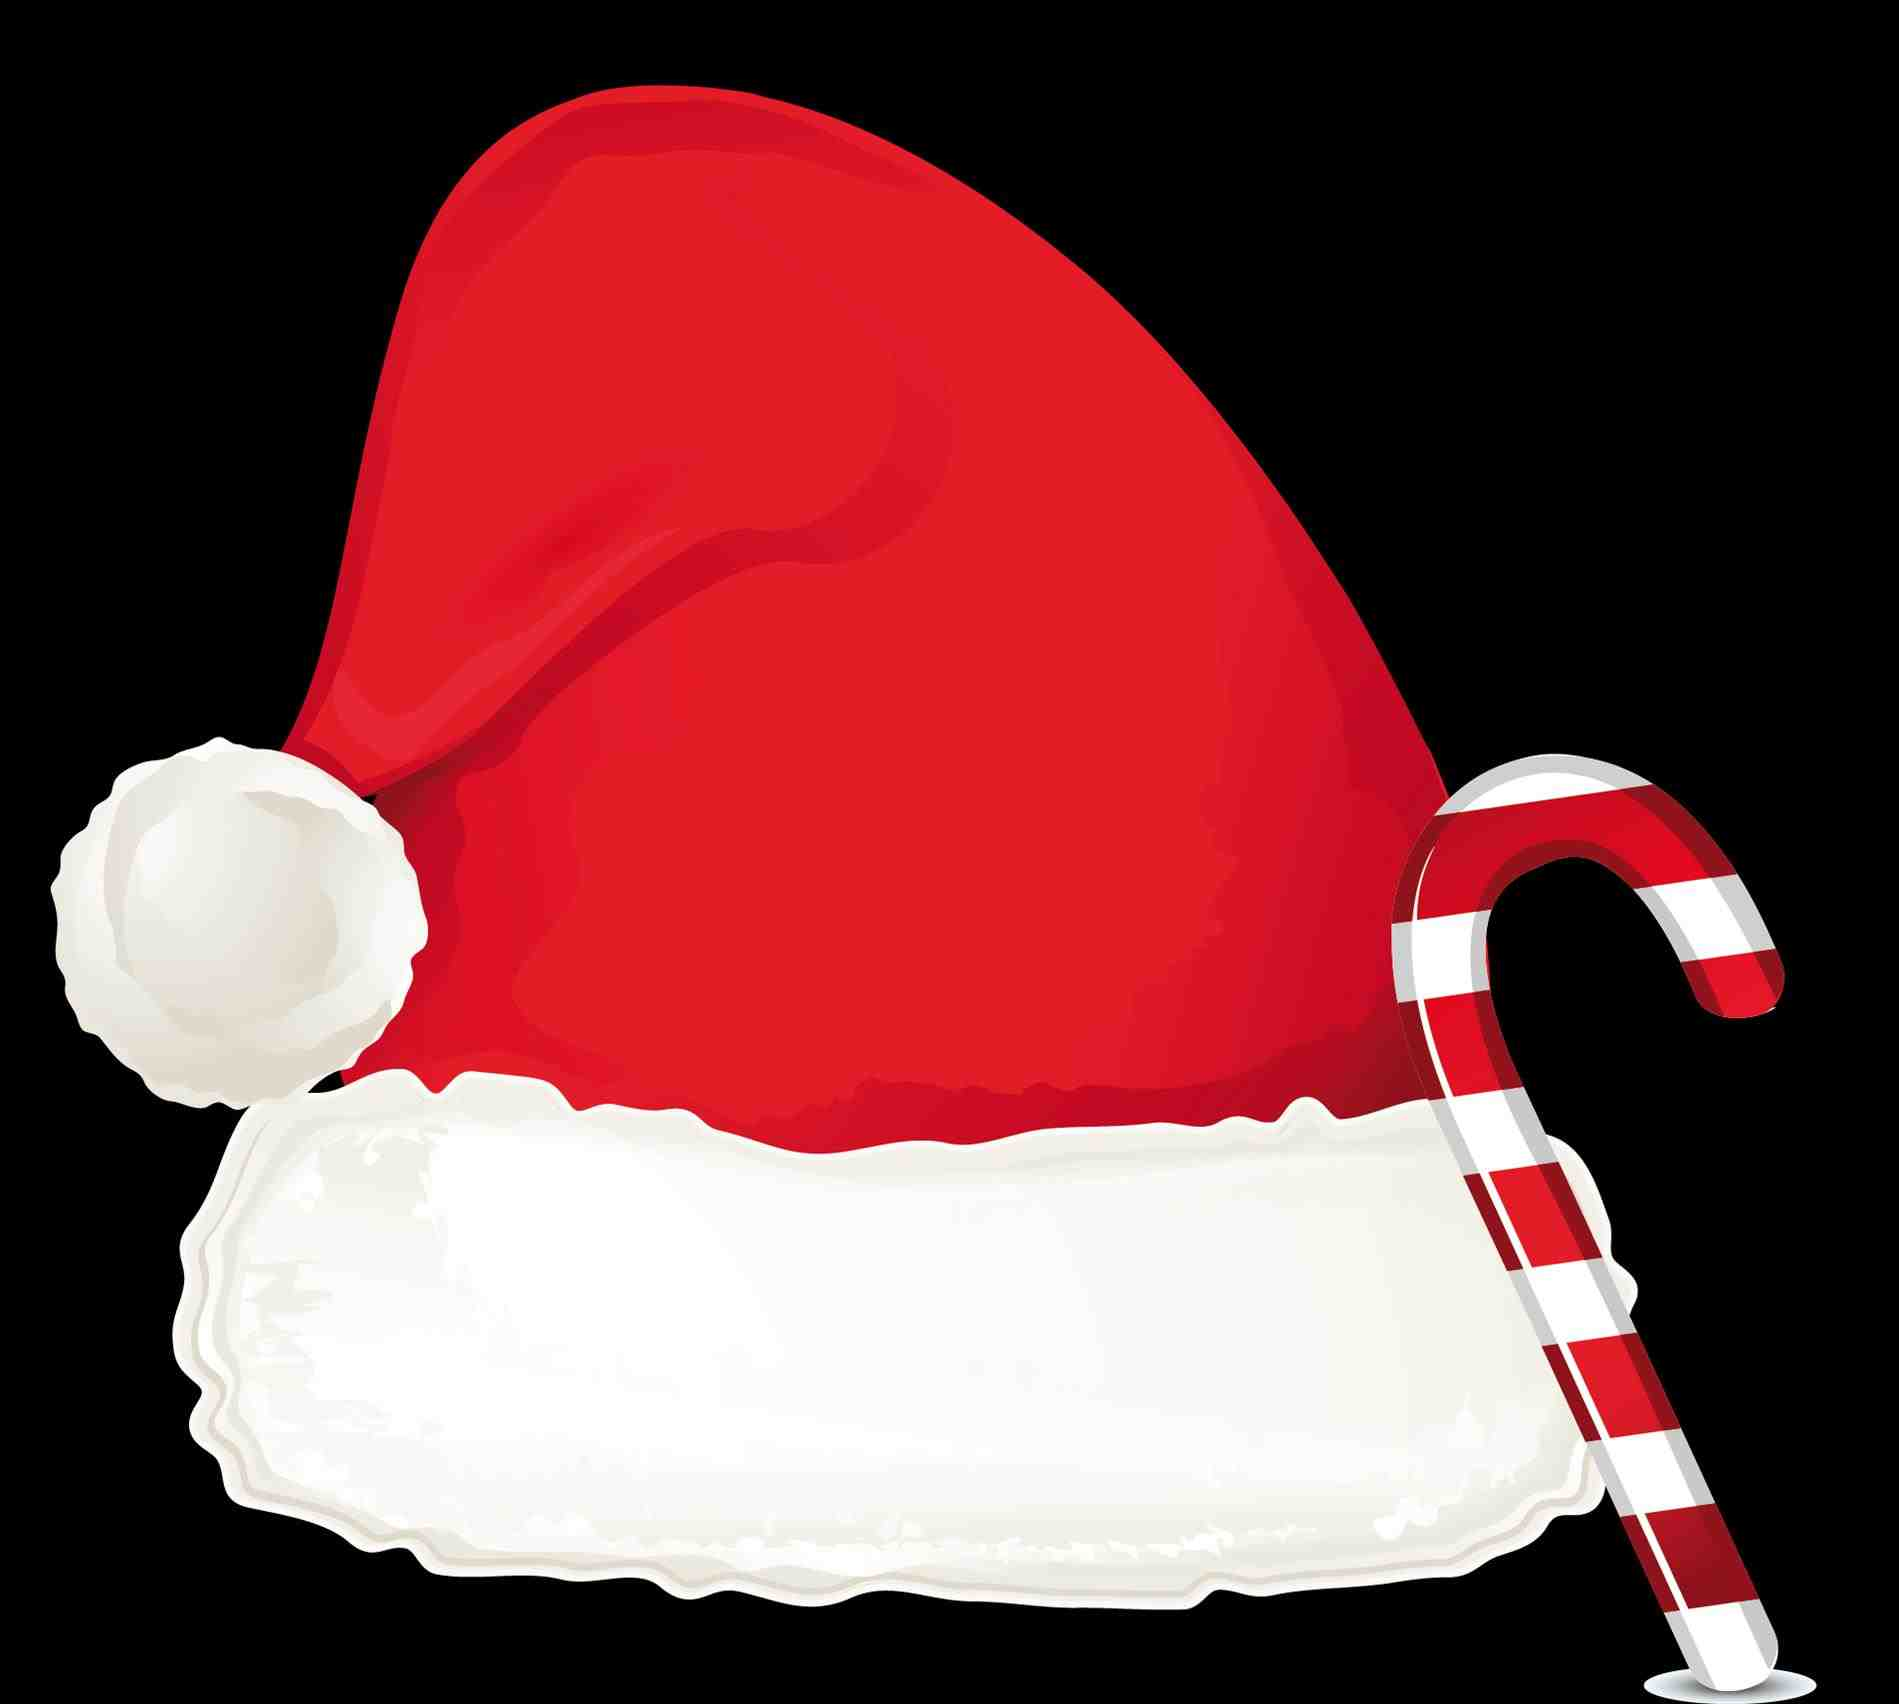 1899x1704 Art S Free Download On Teddy Bear With Teddy Christmas Santa Hat